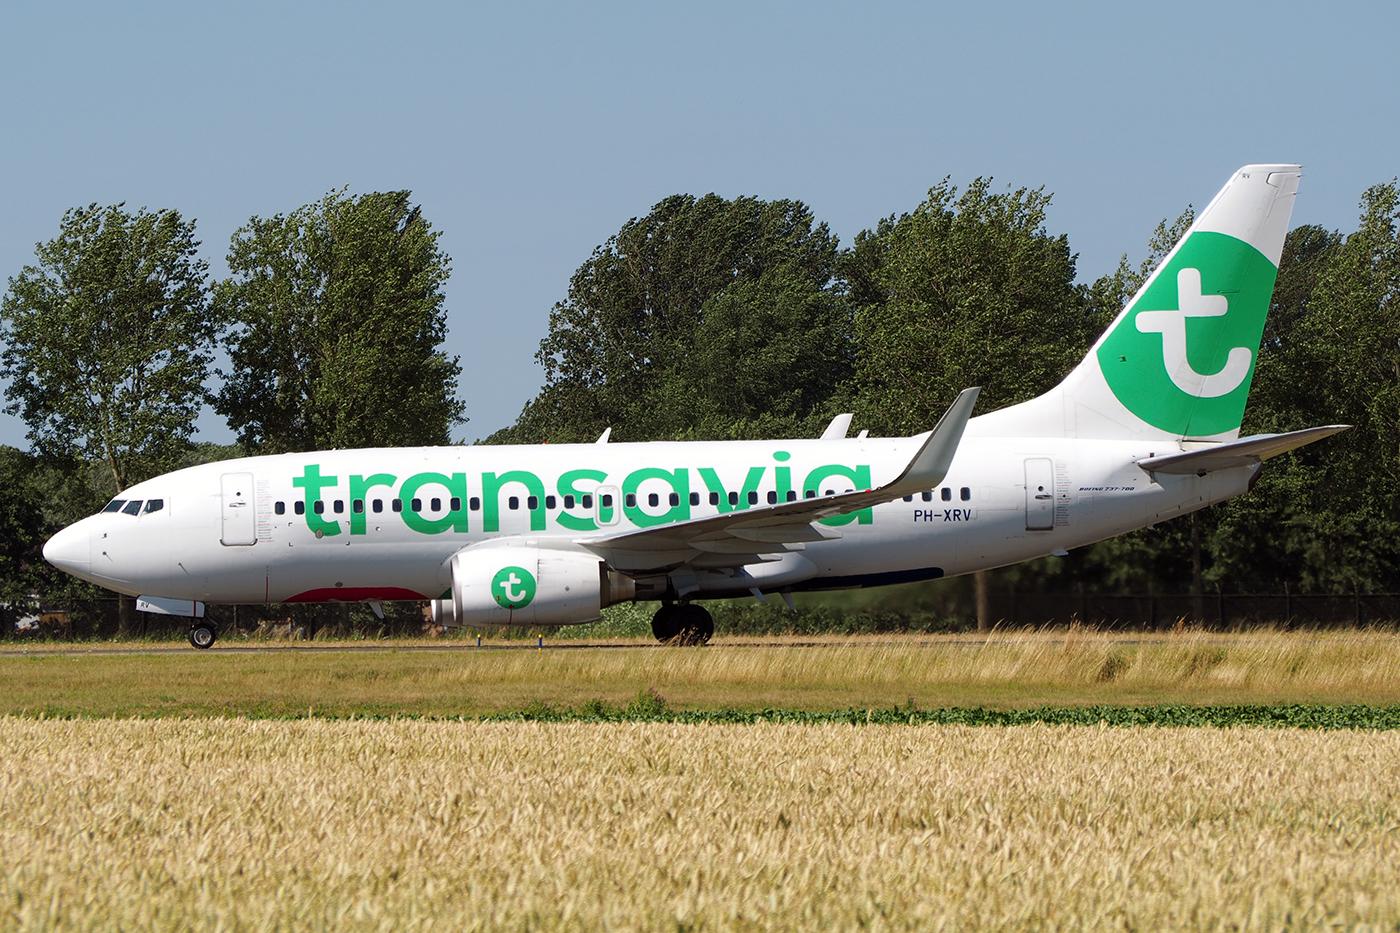 PH-XRV, Transavia, B737-700